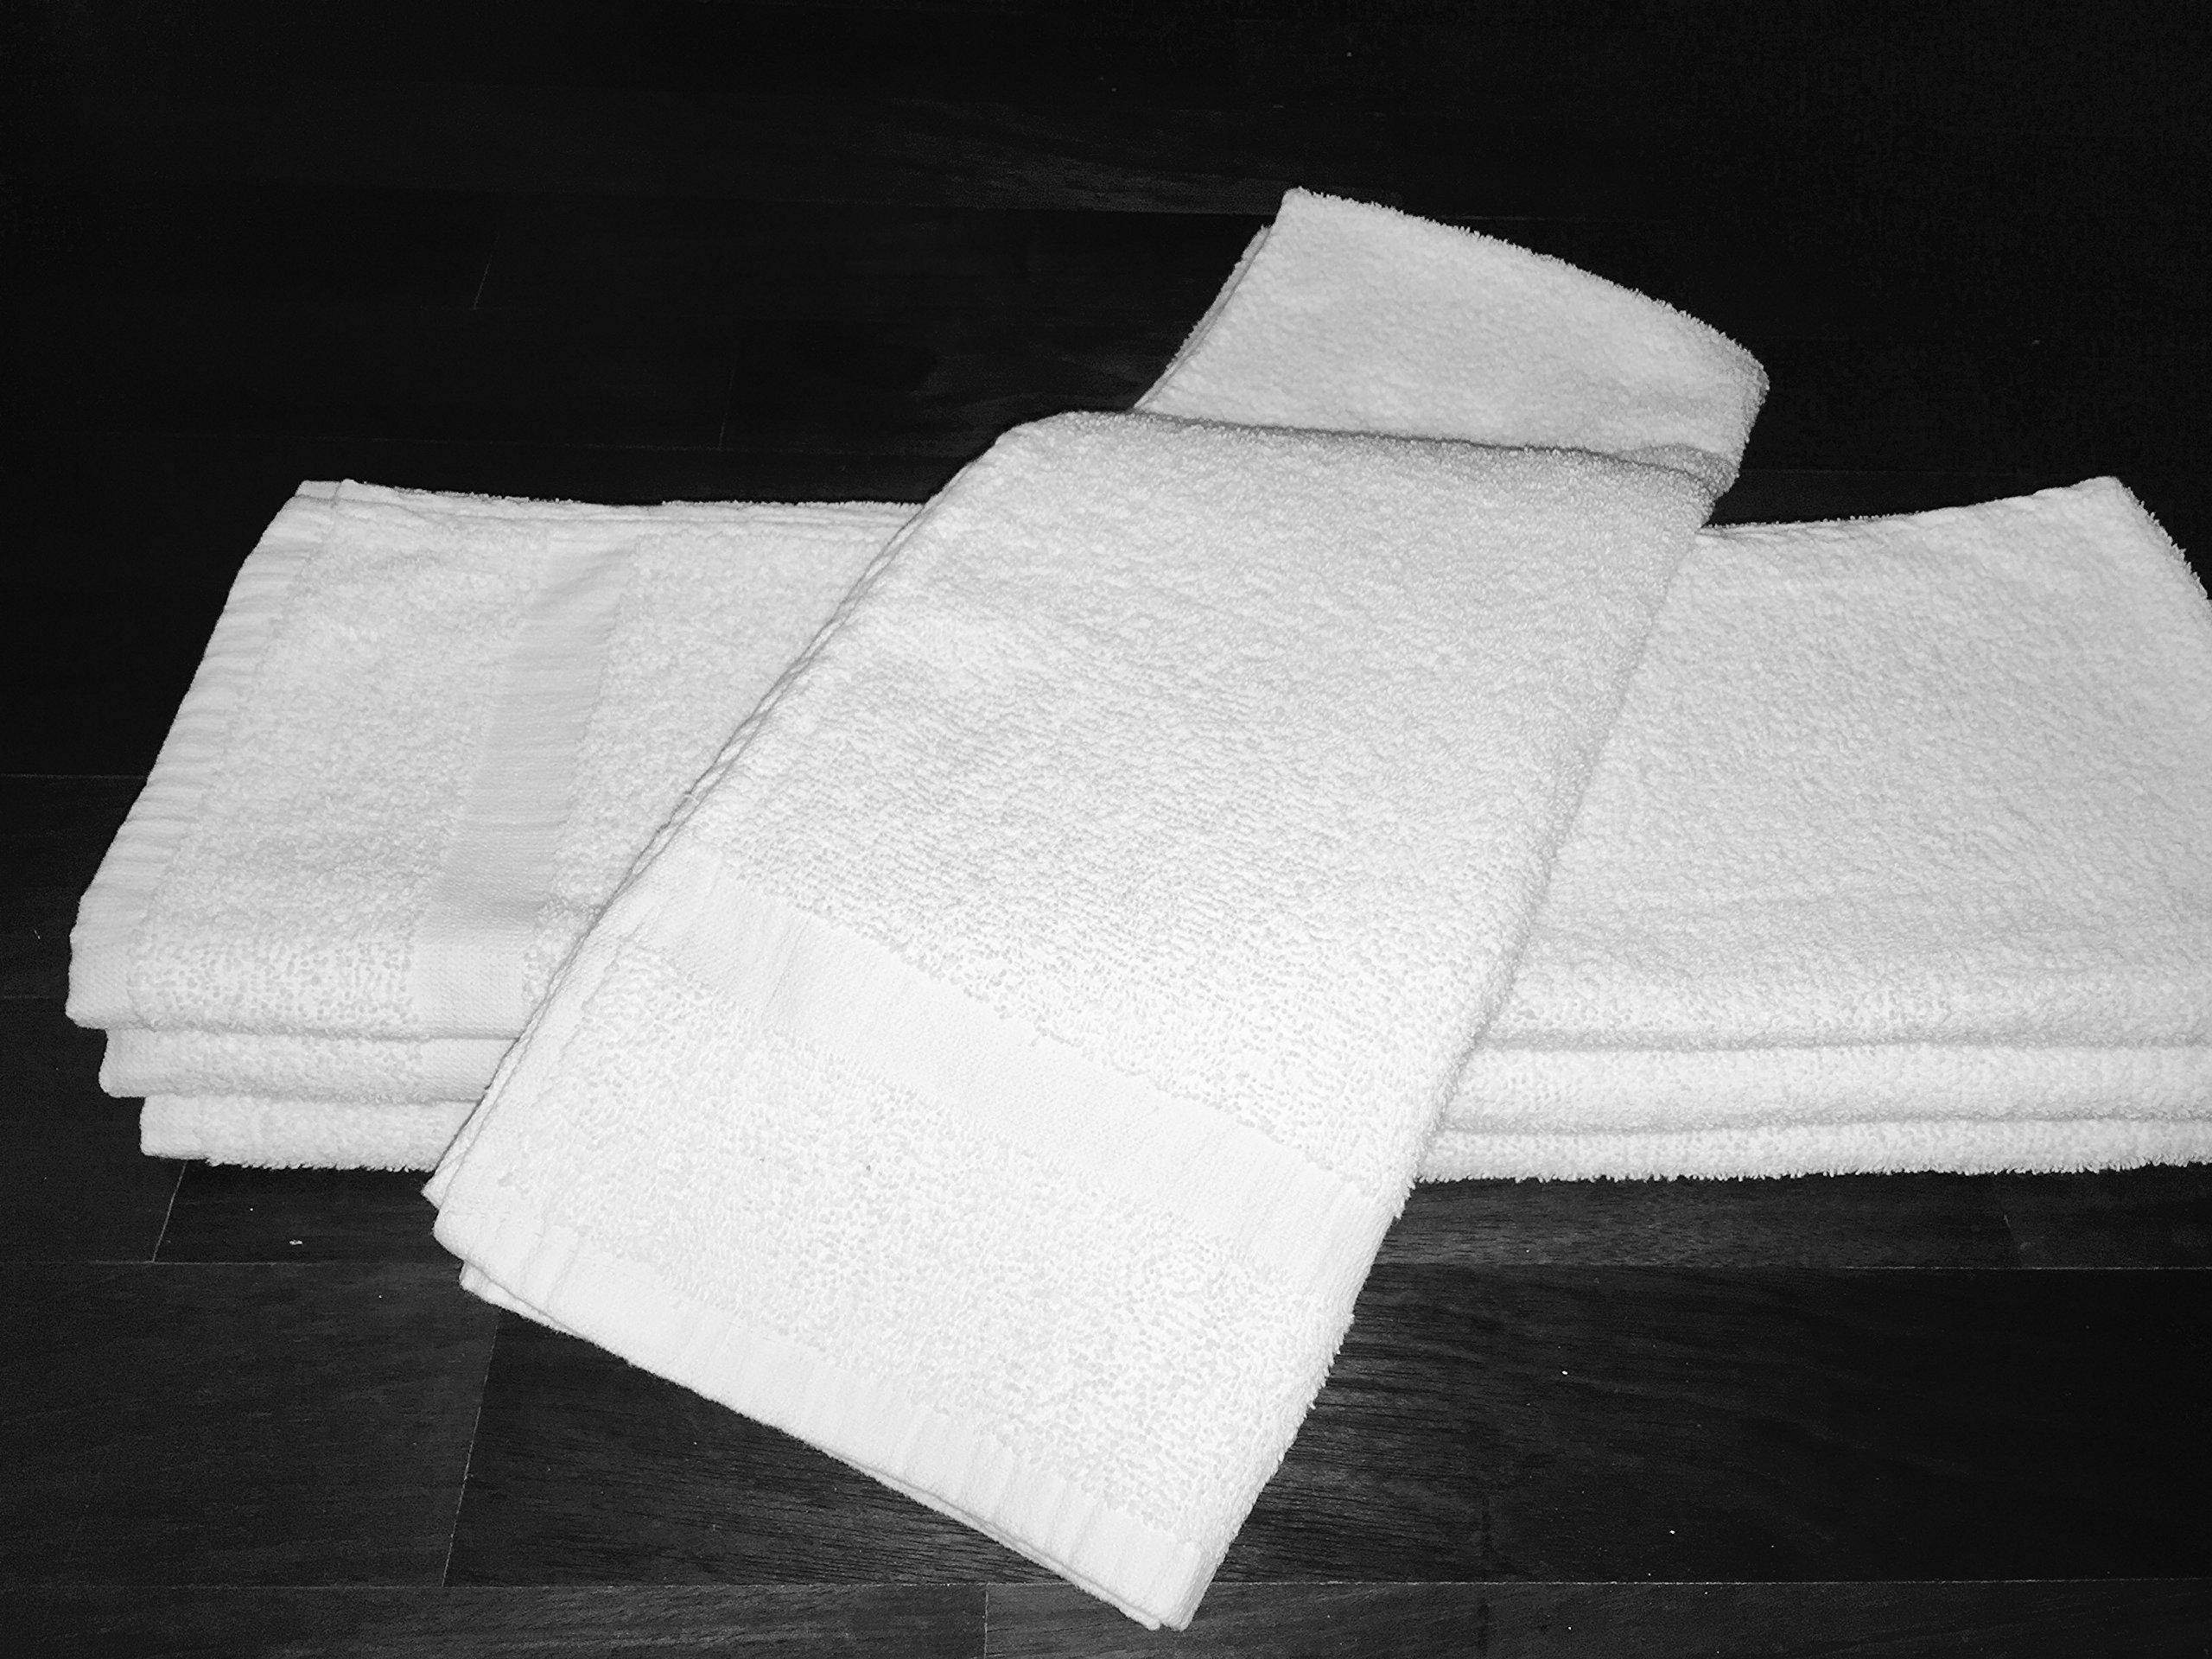 240 NEW WHITE SPA GYM SALON HAND TOWELS CAM BORDER 100% COTTON 15X25 2.25LBS/DZ